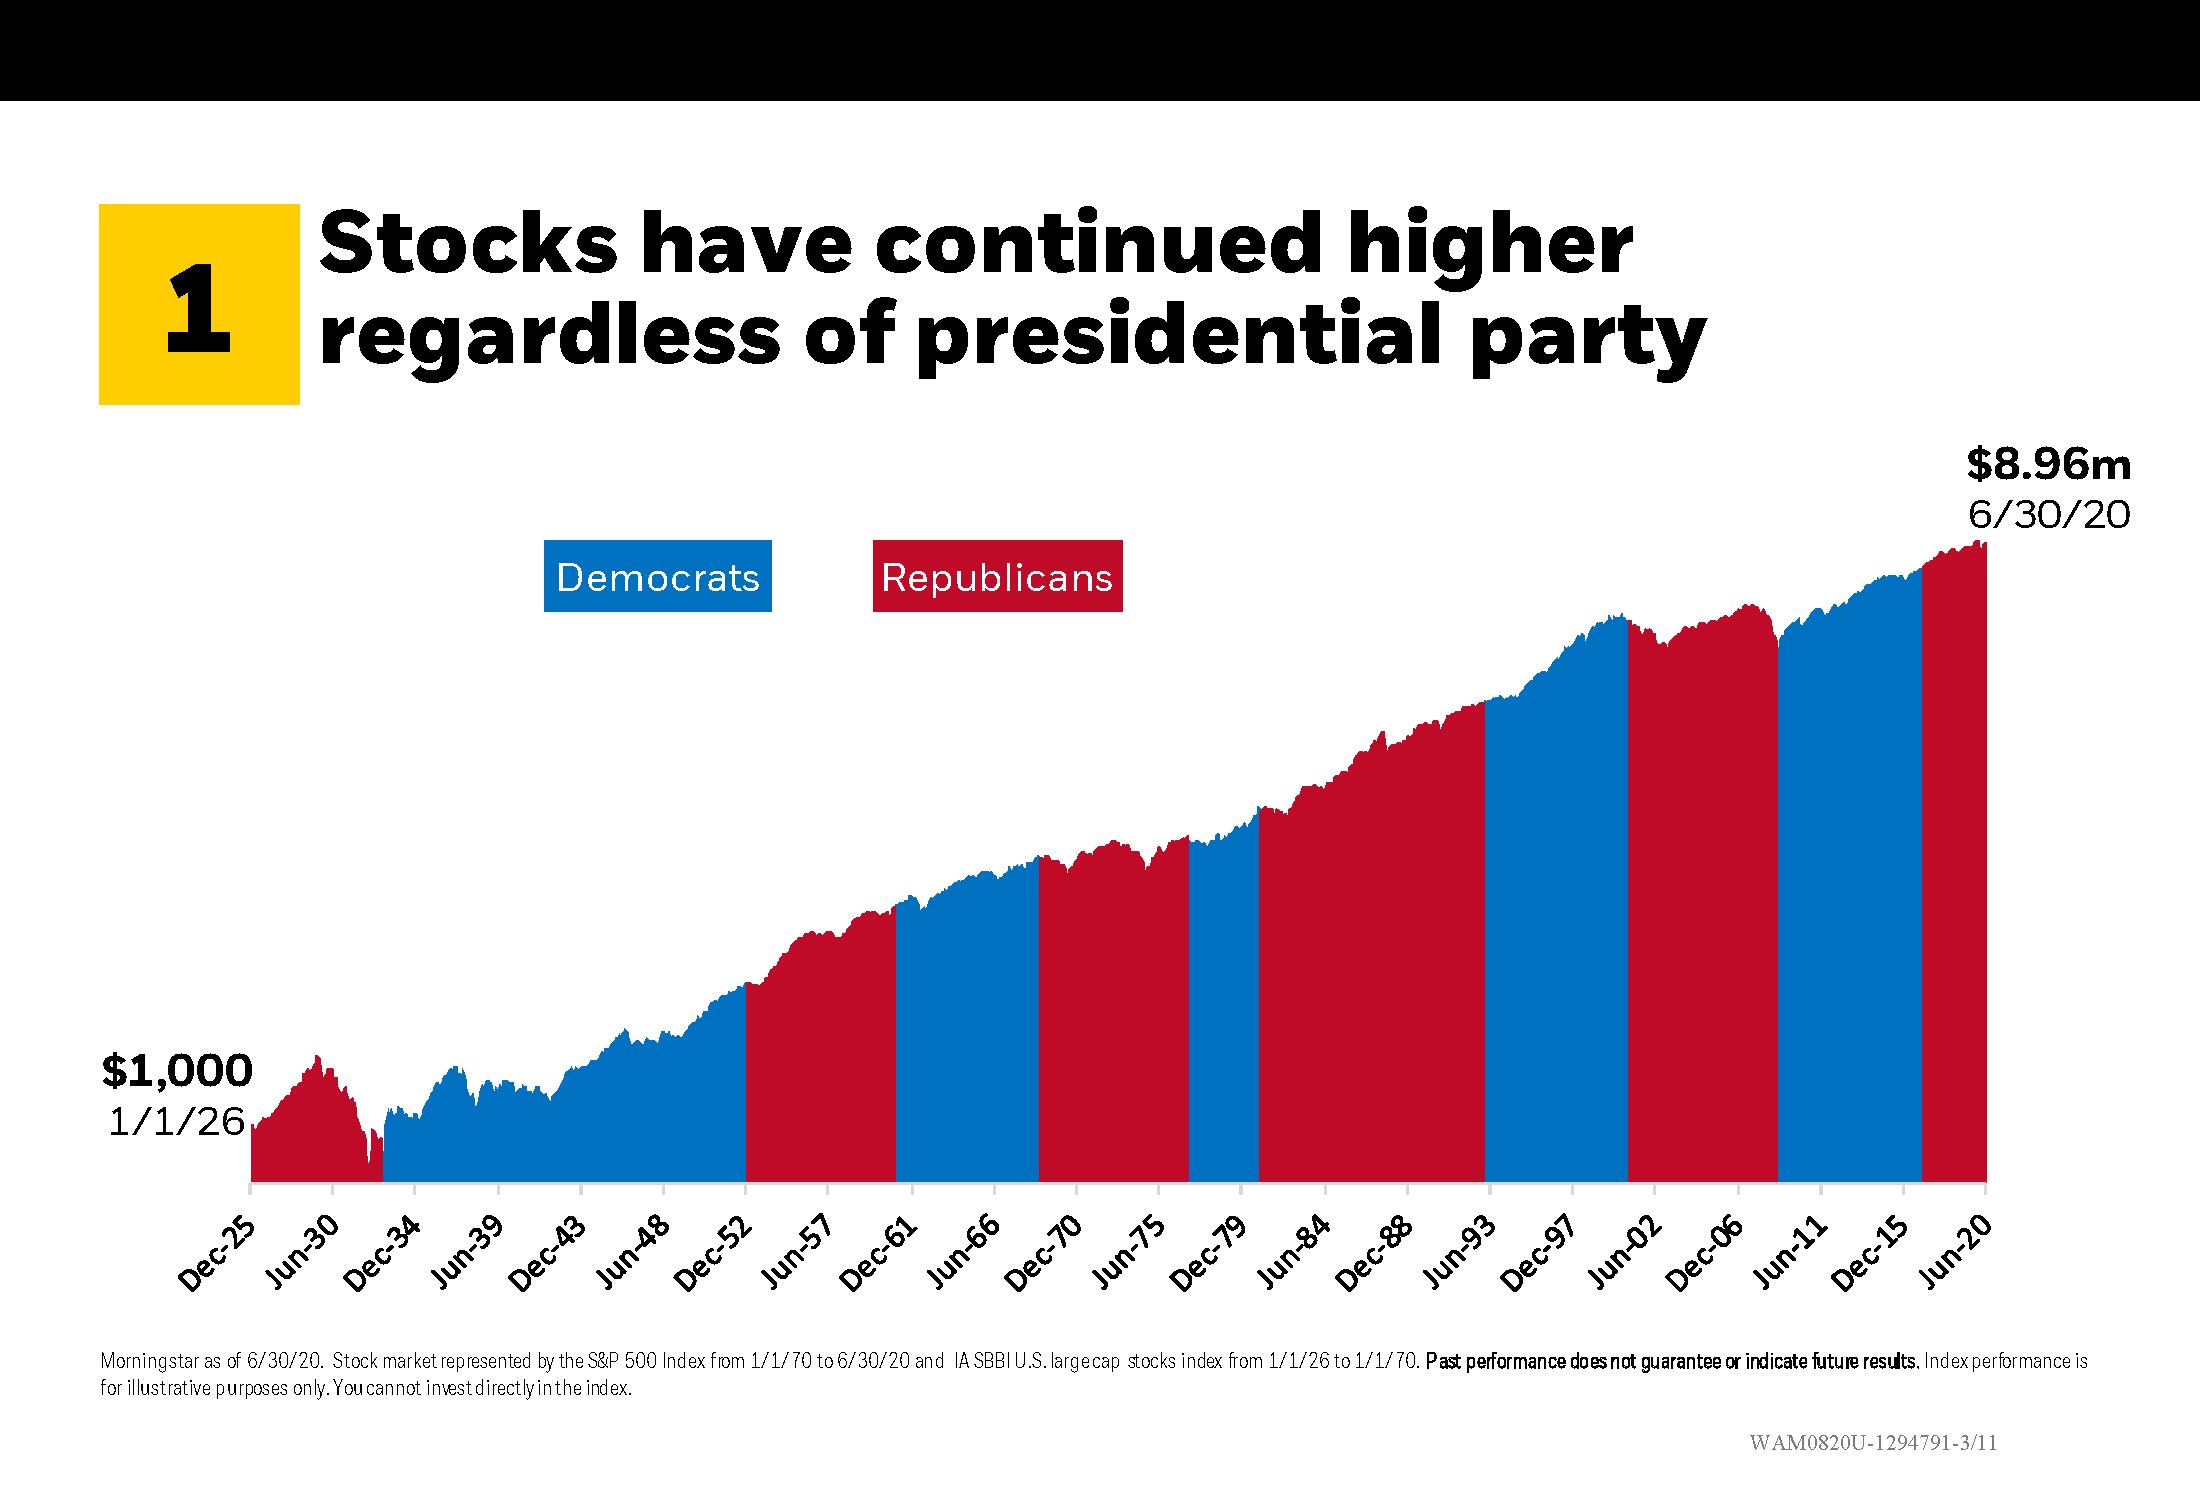 Stocks higher regardless of presidential party